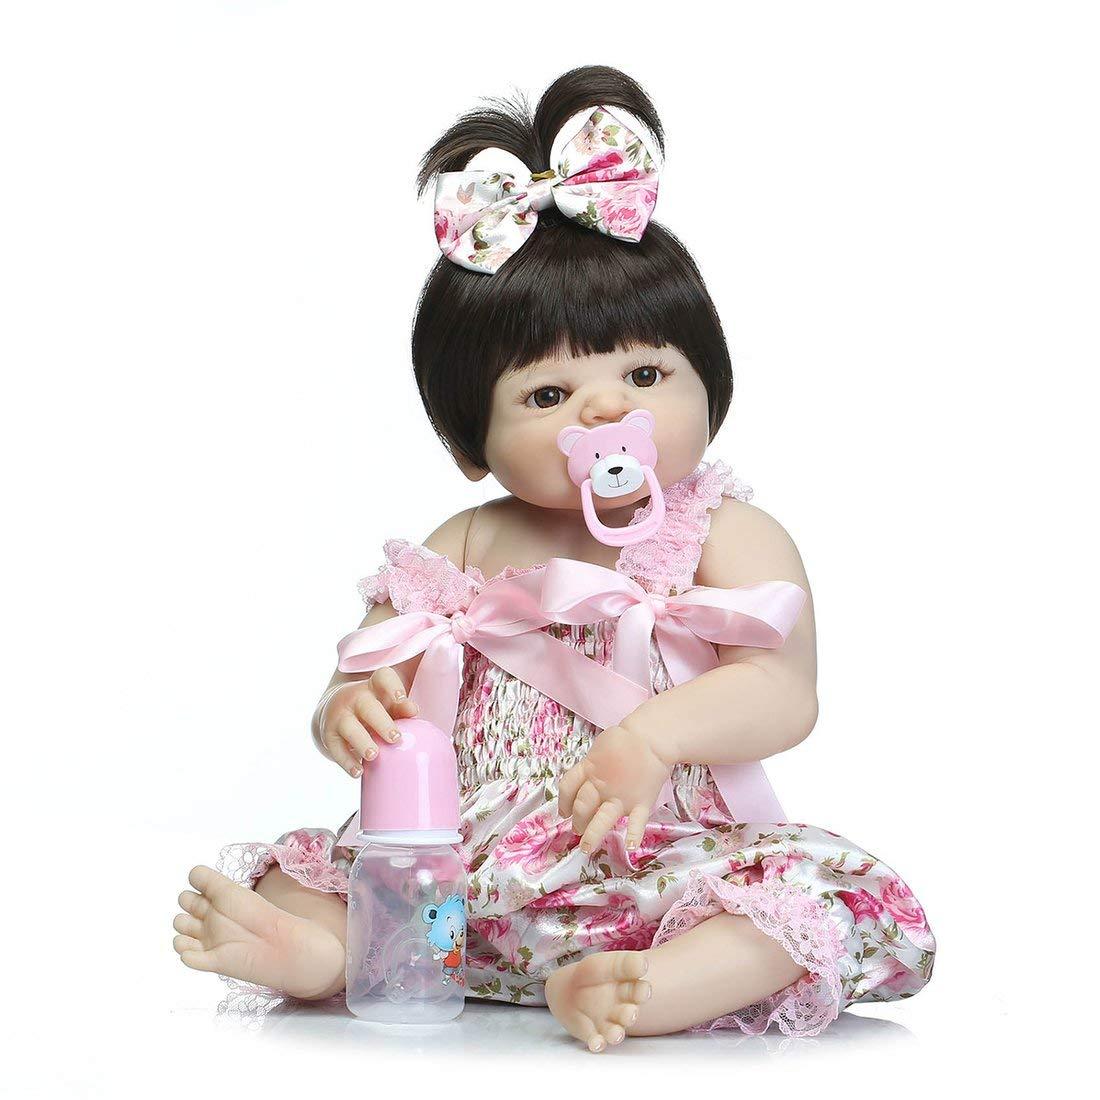 calidad fantástica Formulaone Simulación Bebé Lindo Reborn Doll Girl Girl Girl High Grade Silicona Suave Realista Big Eye recién Nacido Doll Parenting Niños Juguete  orden en línea